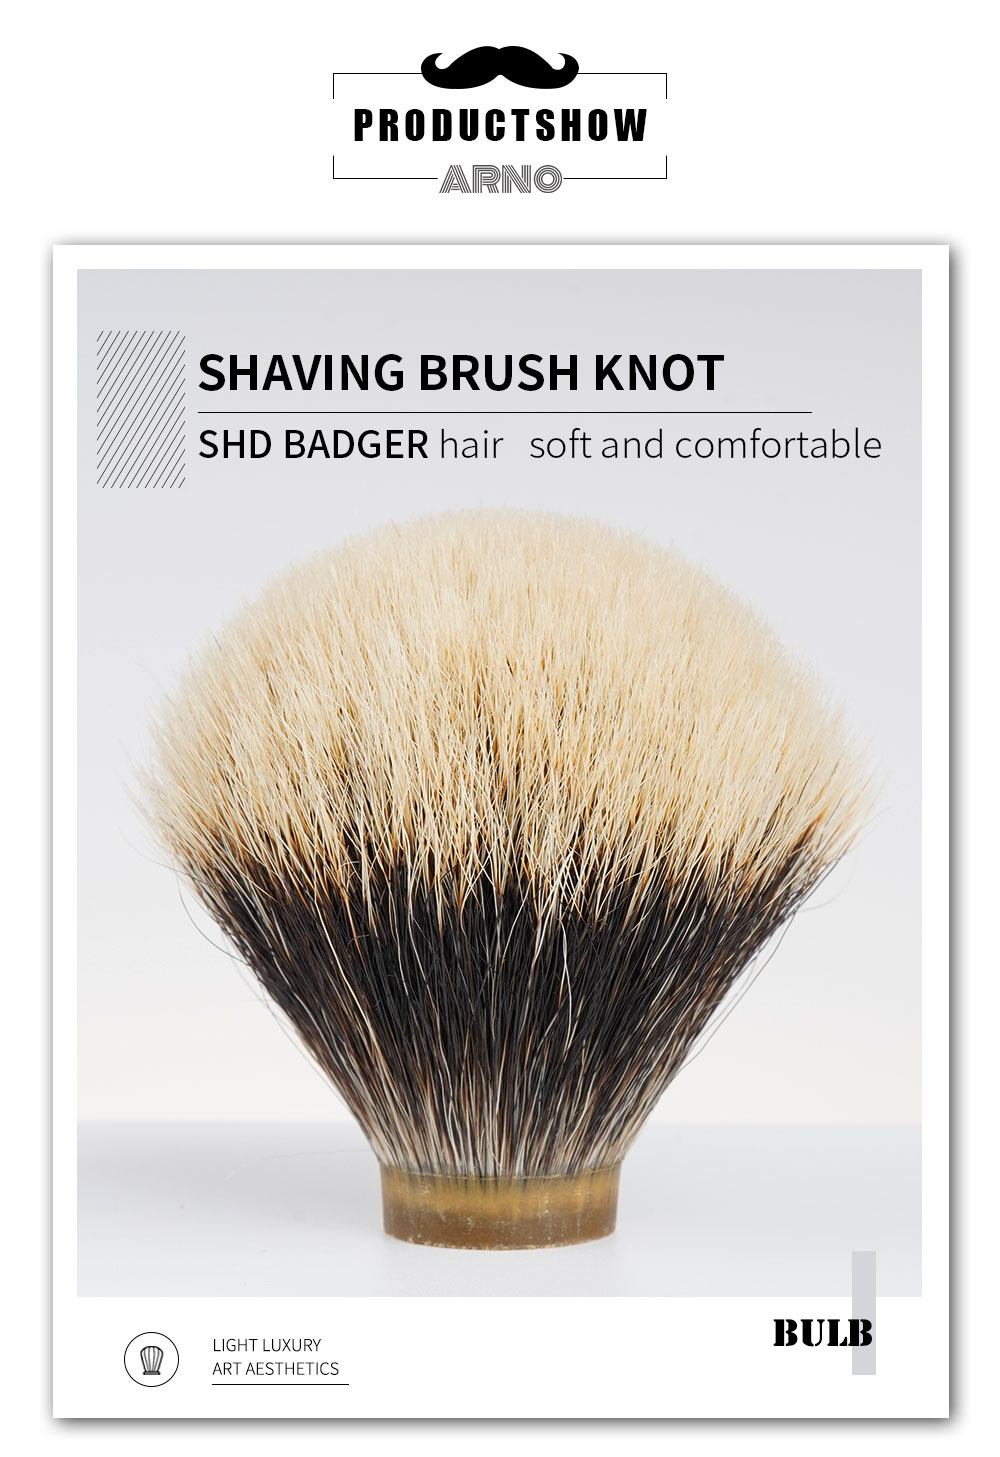 Arnobrush-shd dois banda-nobre texugo cabelo escova de barbear nós